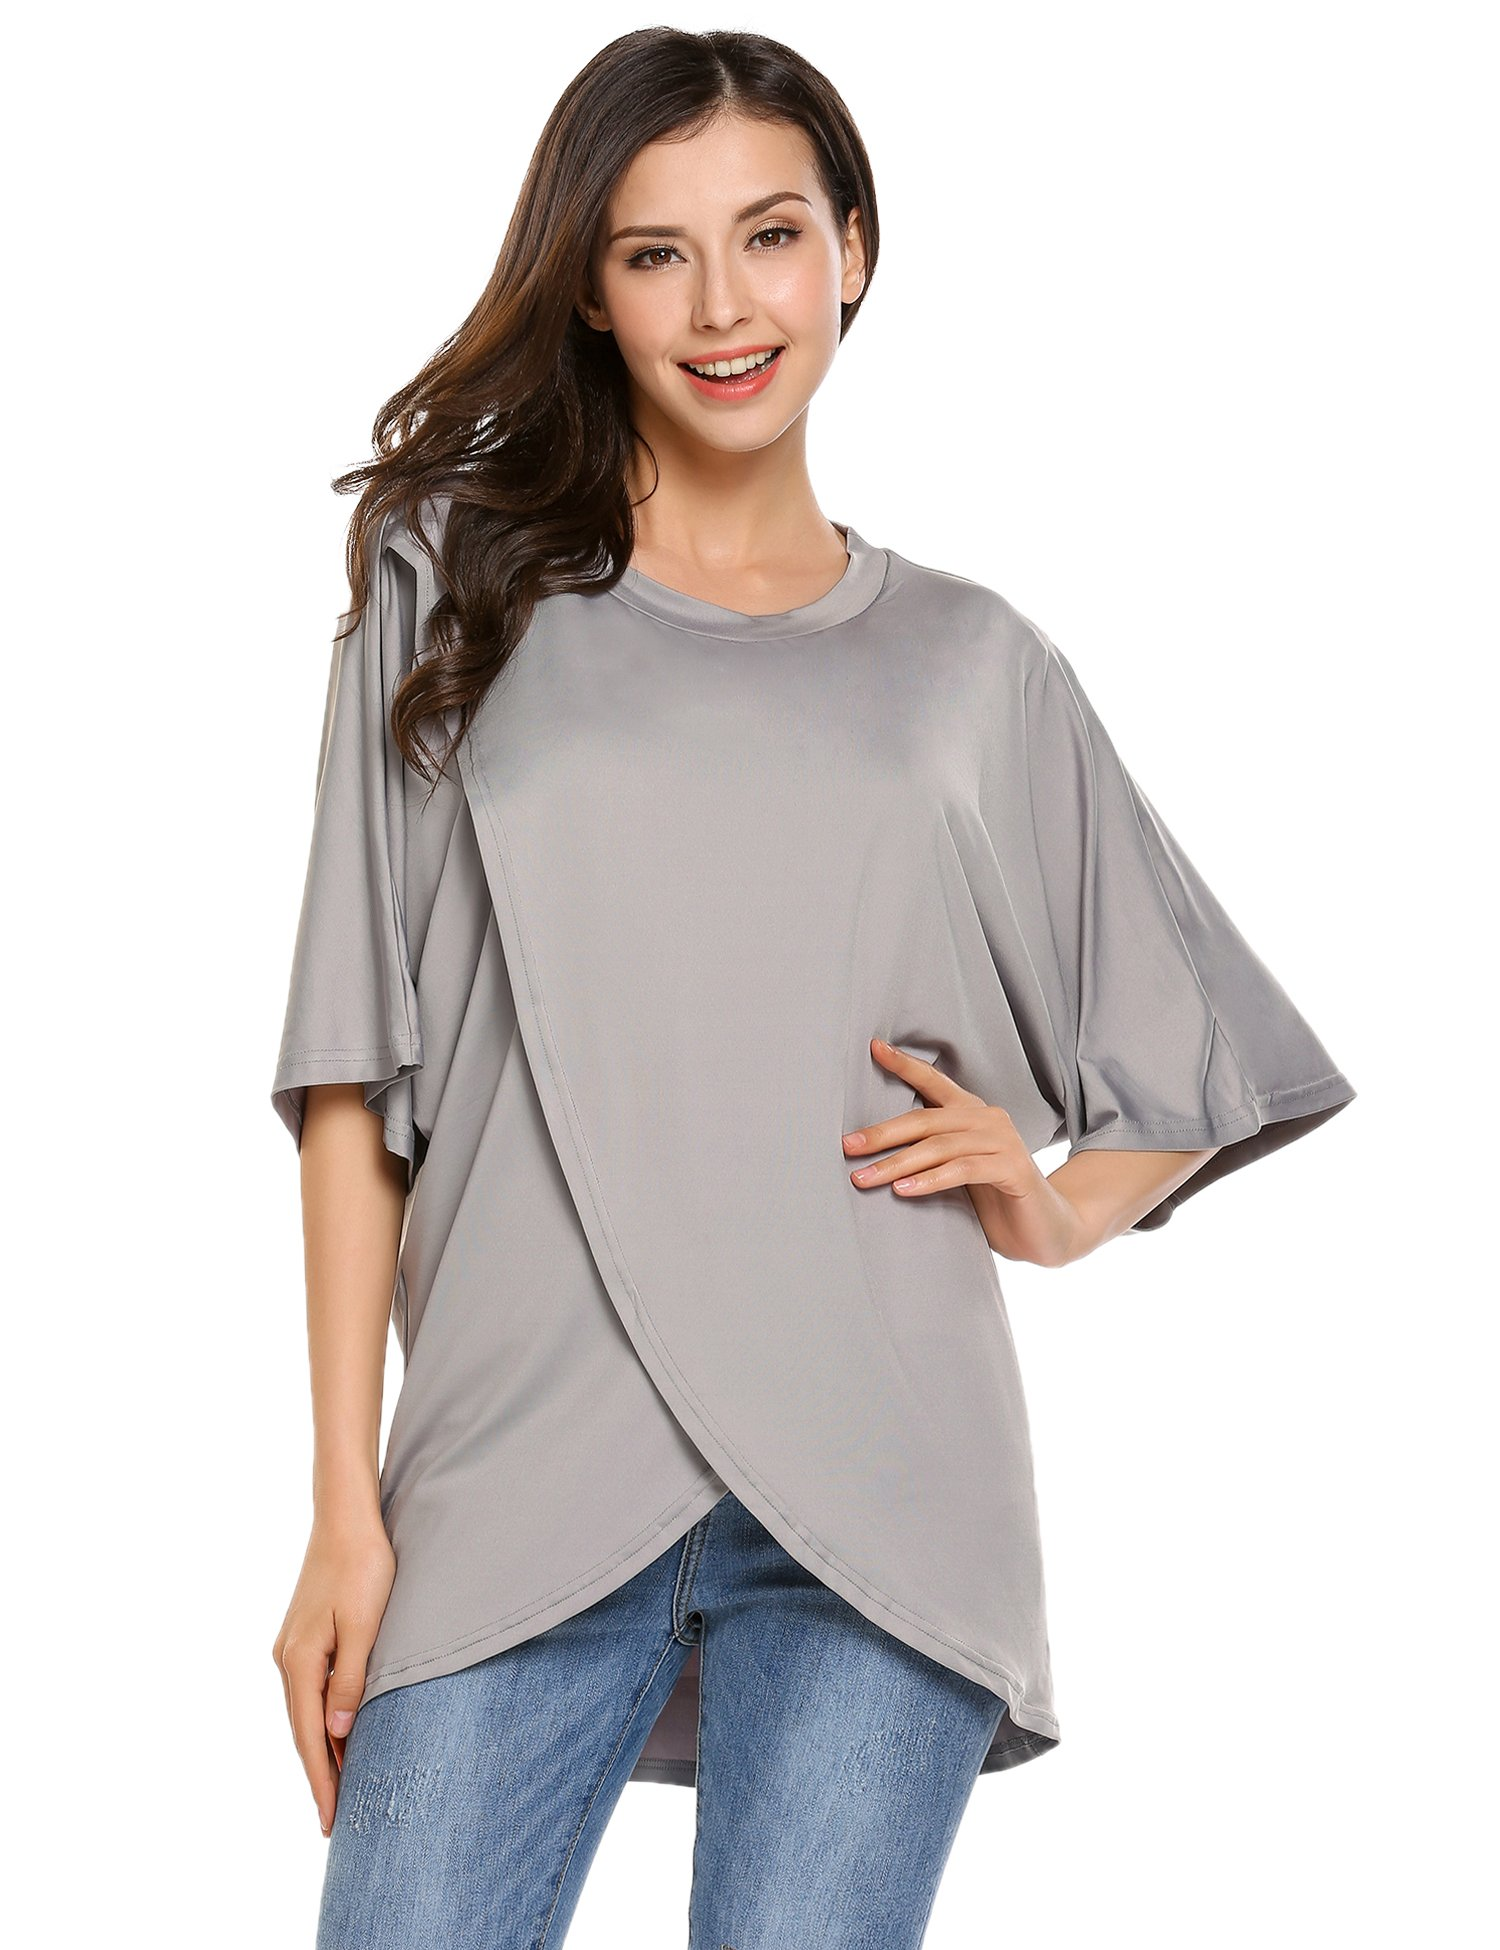 Beyove Women 1/2 Sleeve Round Neck T Shirt Cross Wrap Front Top(Grey,S)